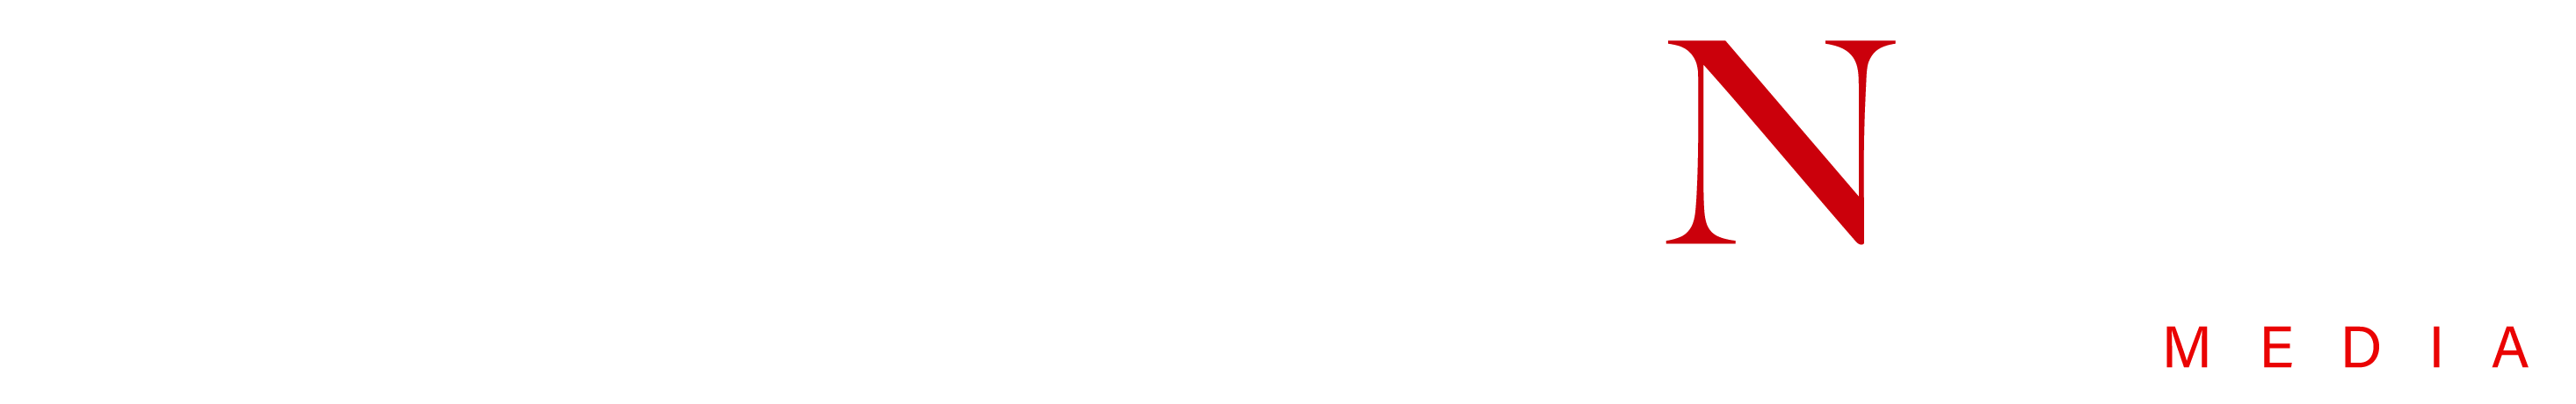 LOGO YACHTING NEWS bianco